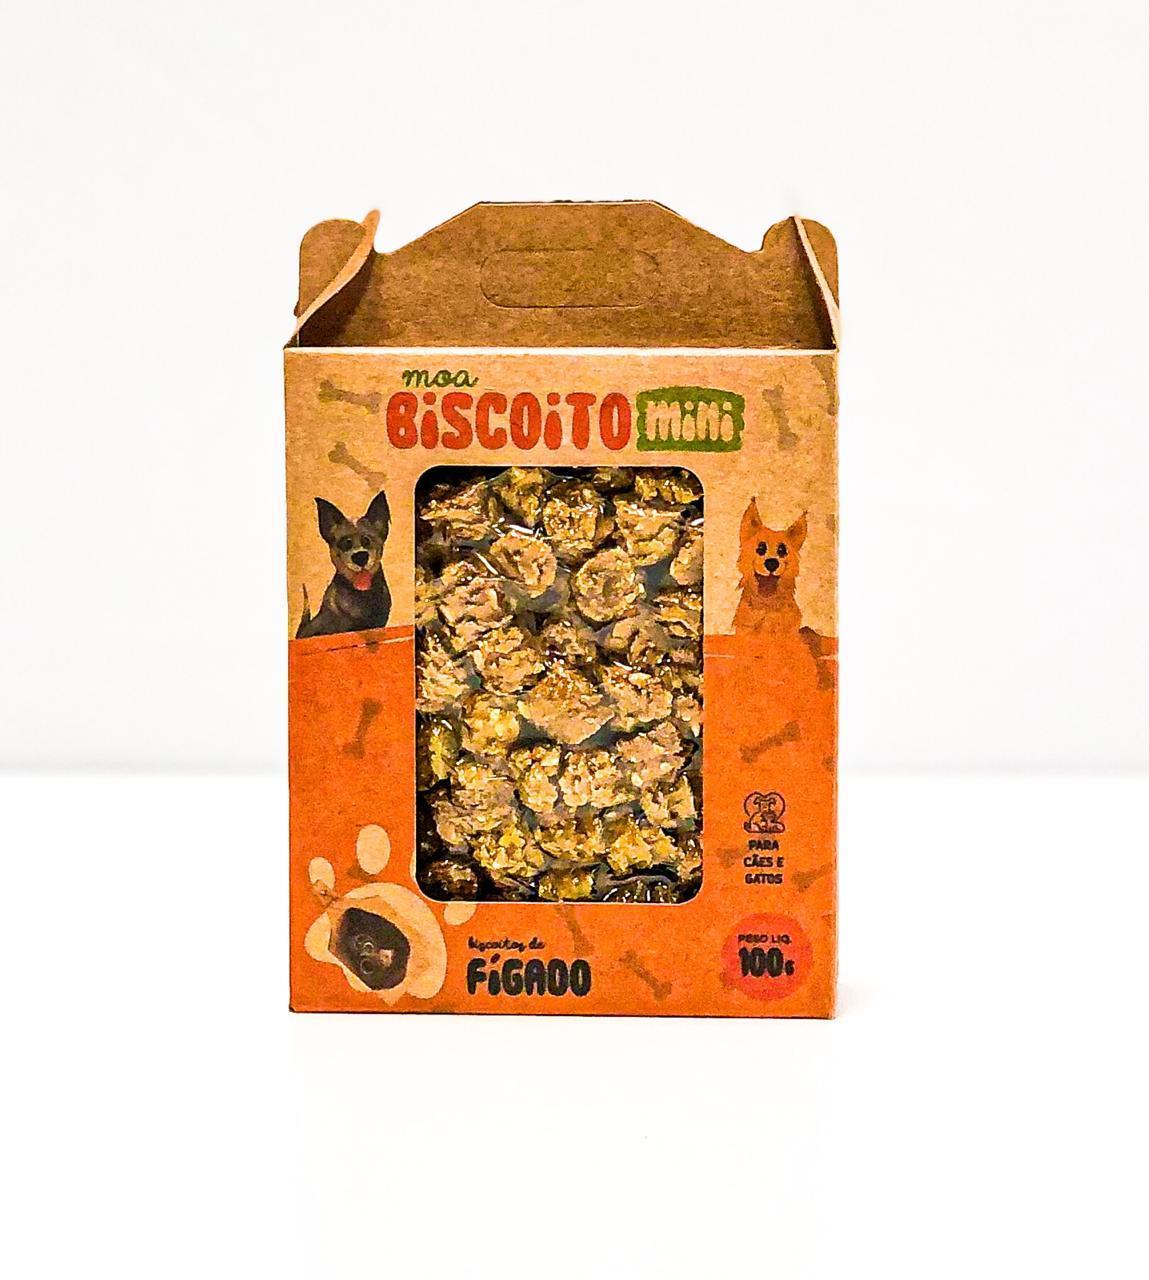 MOABISCOITO MINI - Figado 100GR